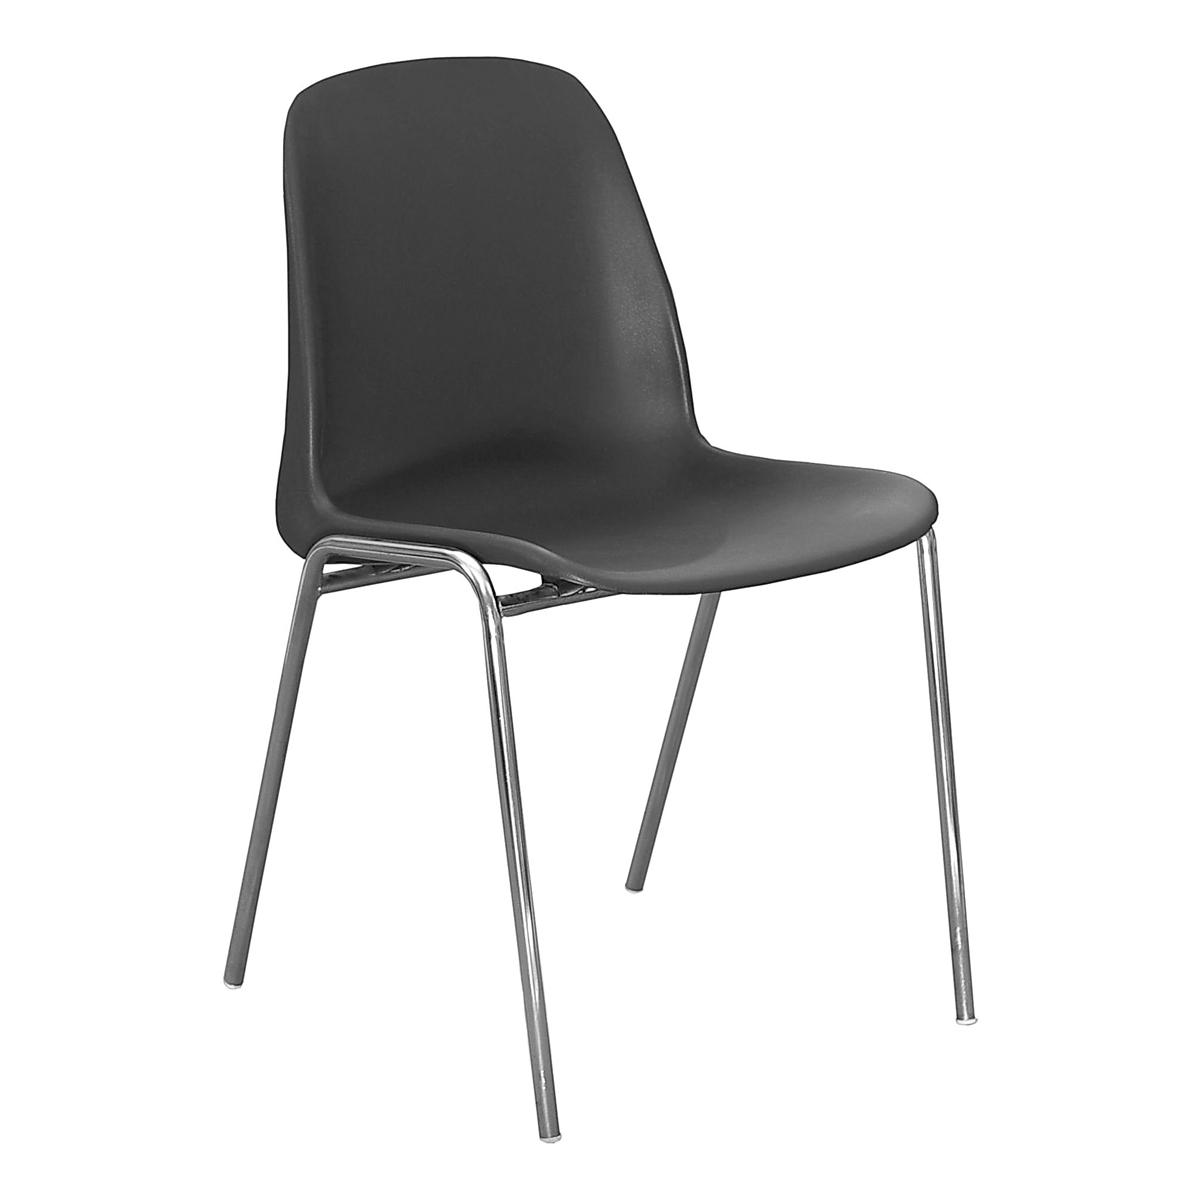 Stuhl Reihenstuhl anthrazit